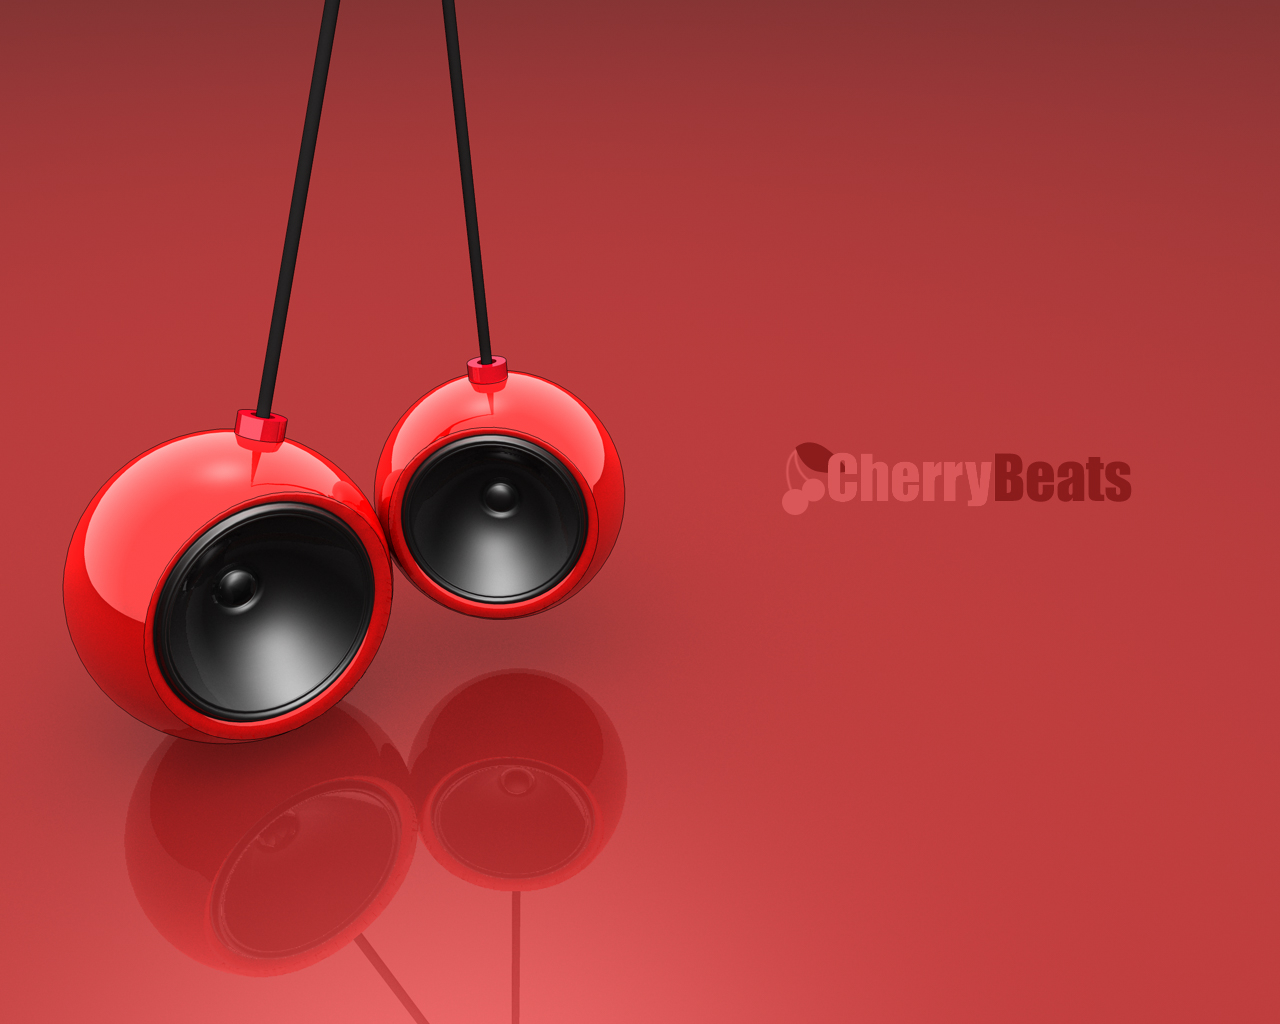 Cherry Beats by bra1n